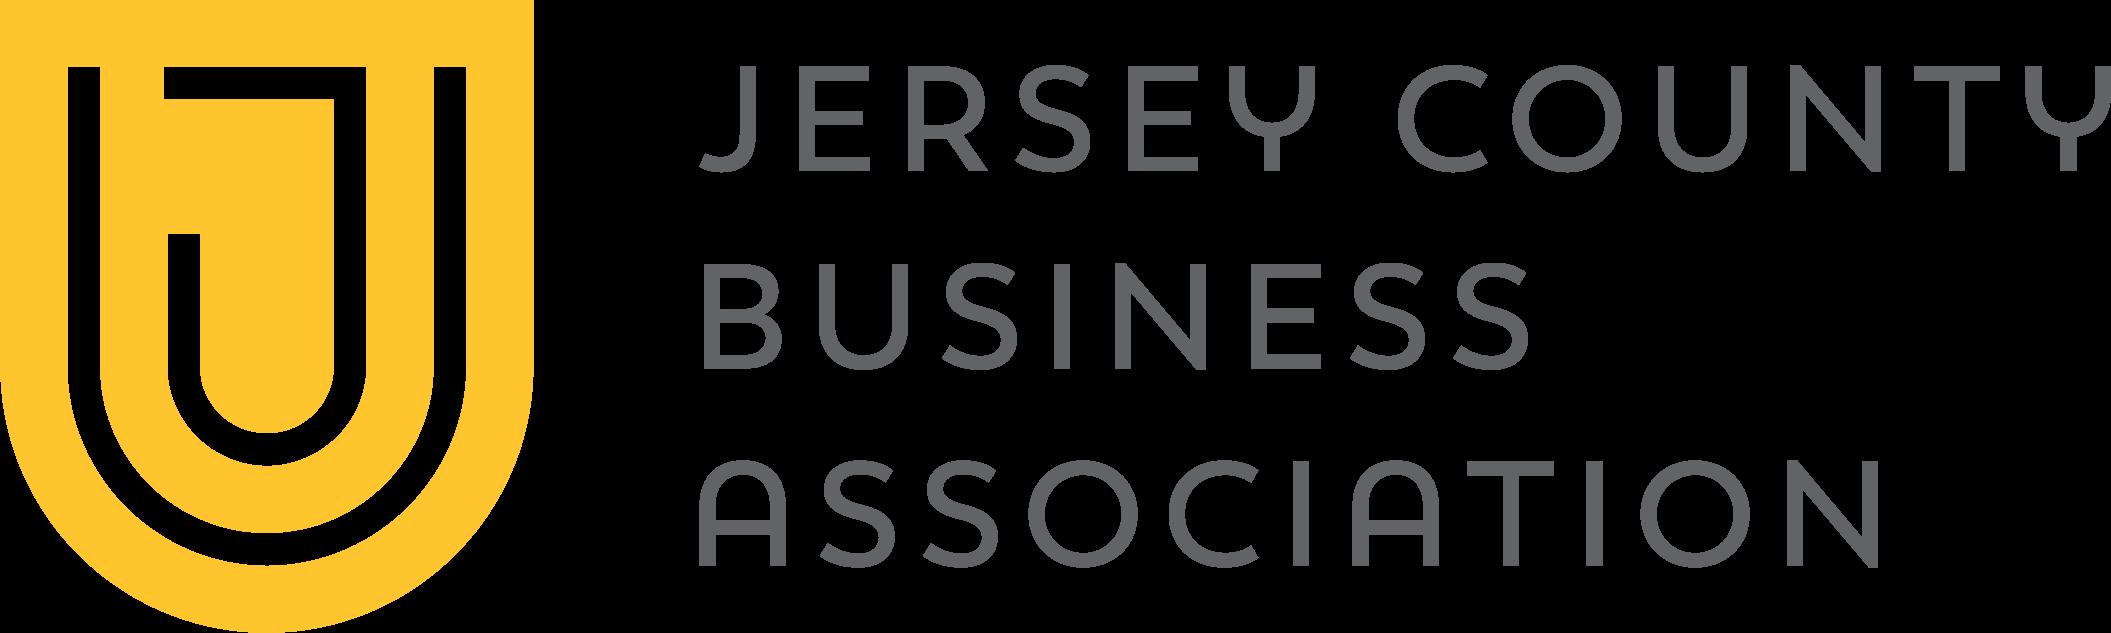 Jersey County Business Association